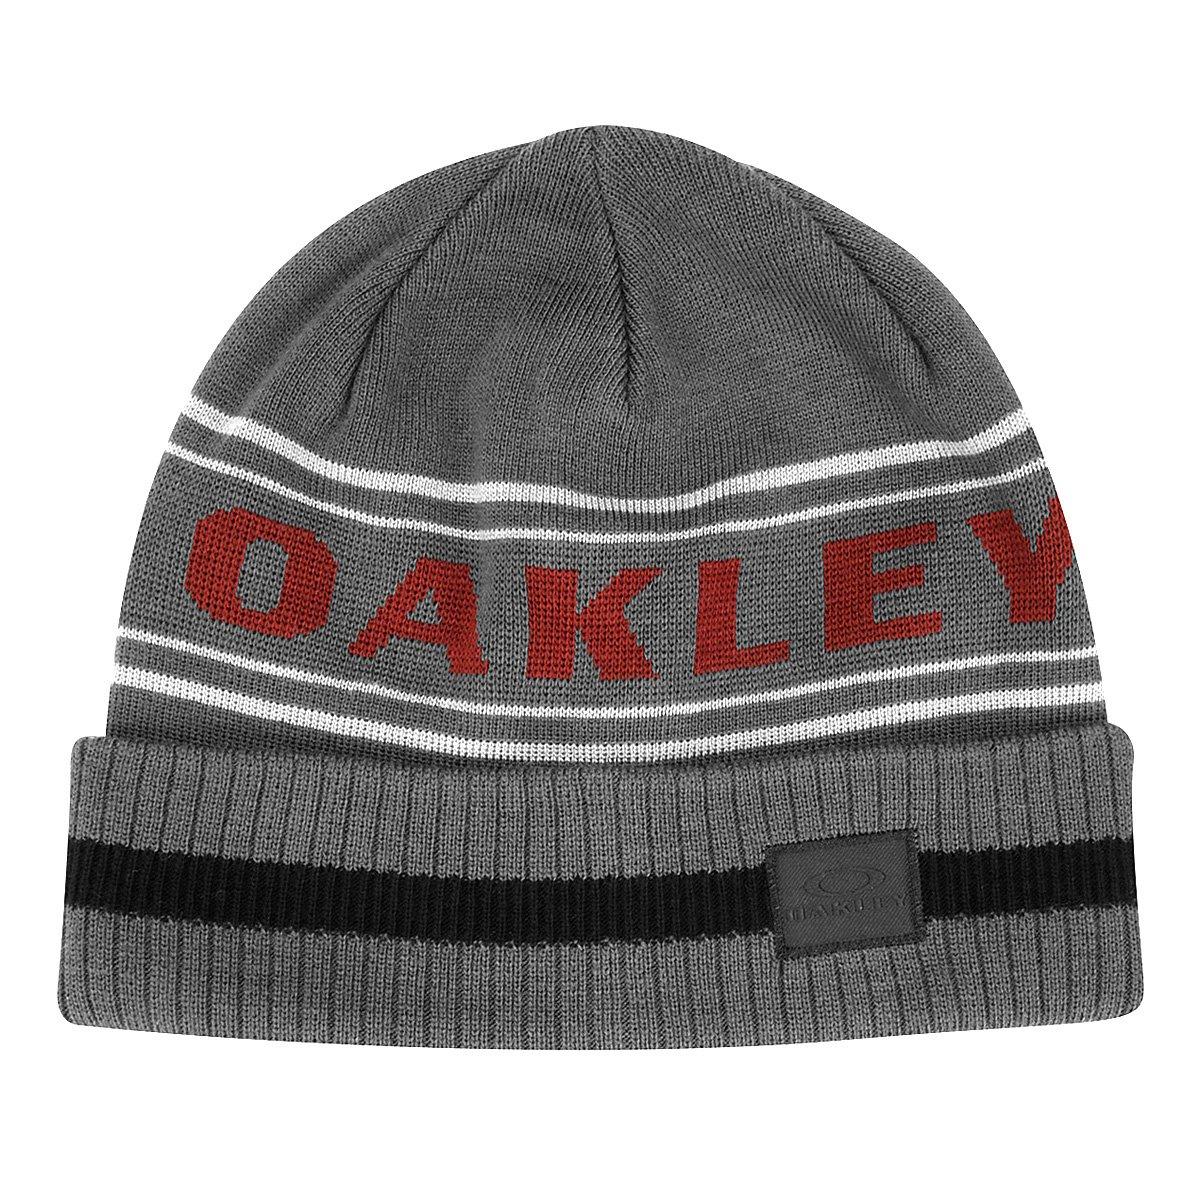 Gorro Oakley Rockgarden Cuff Beanie - Compre Agora  0dce3d7d753